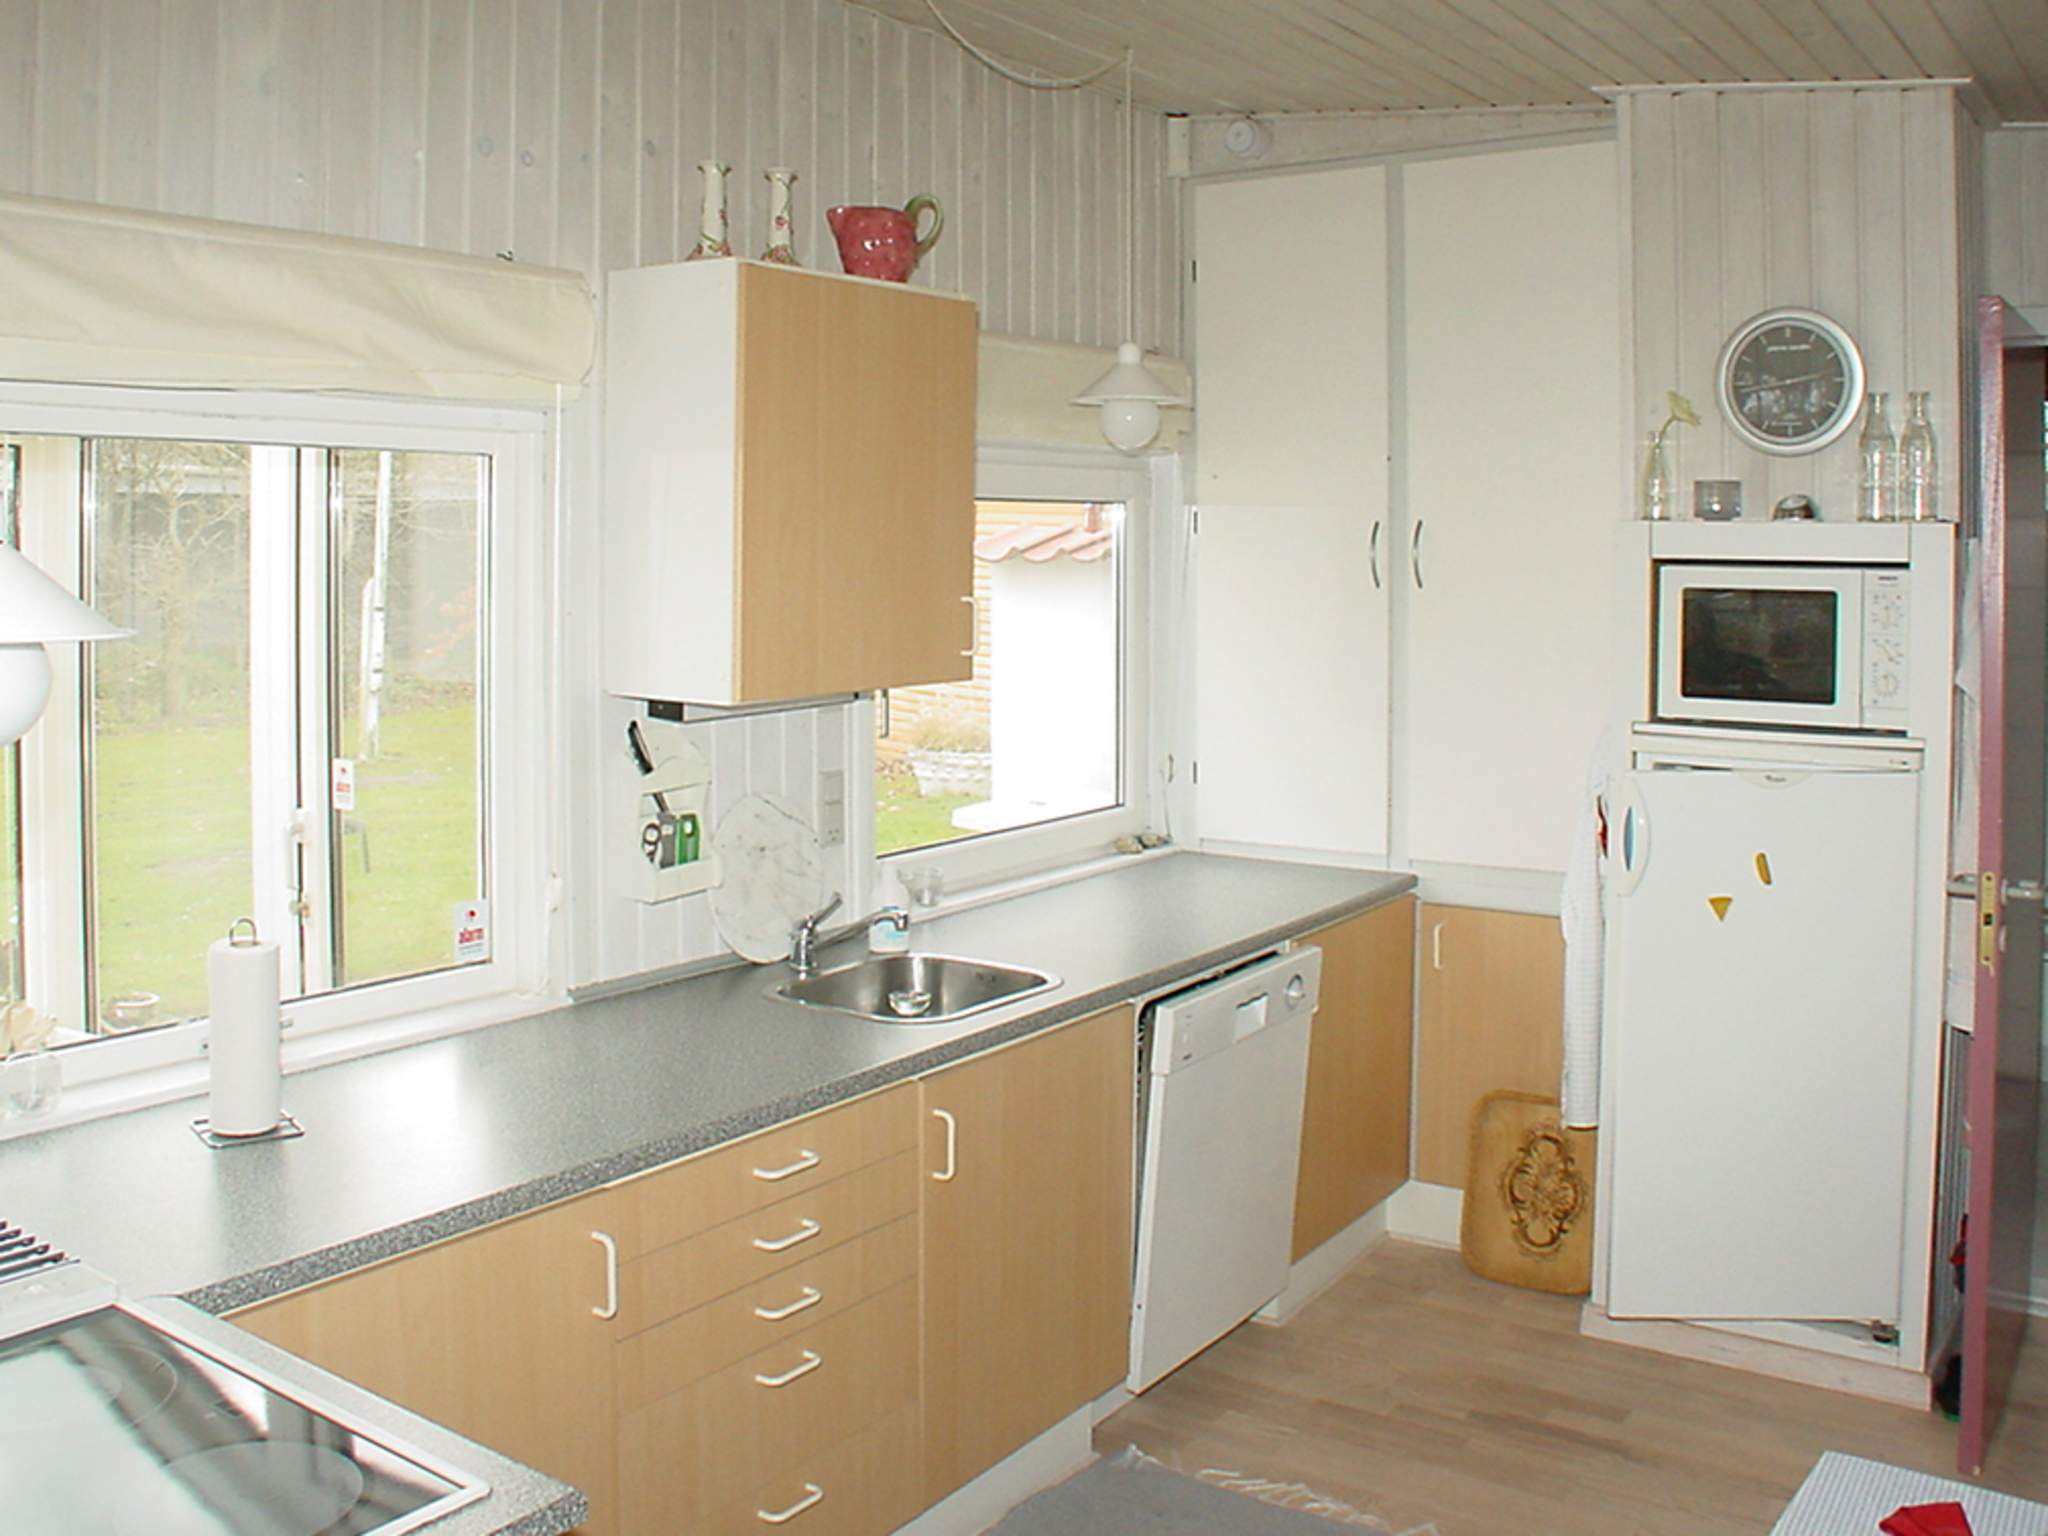 Ferienhaus Øster Hurup (226841), Øster Hurup, , Dänische Ostsee, Dänemark, Bild 6